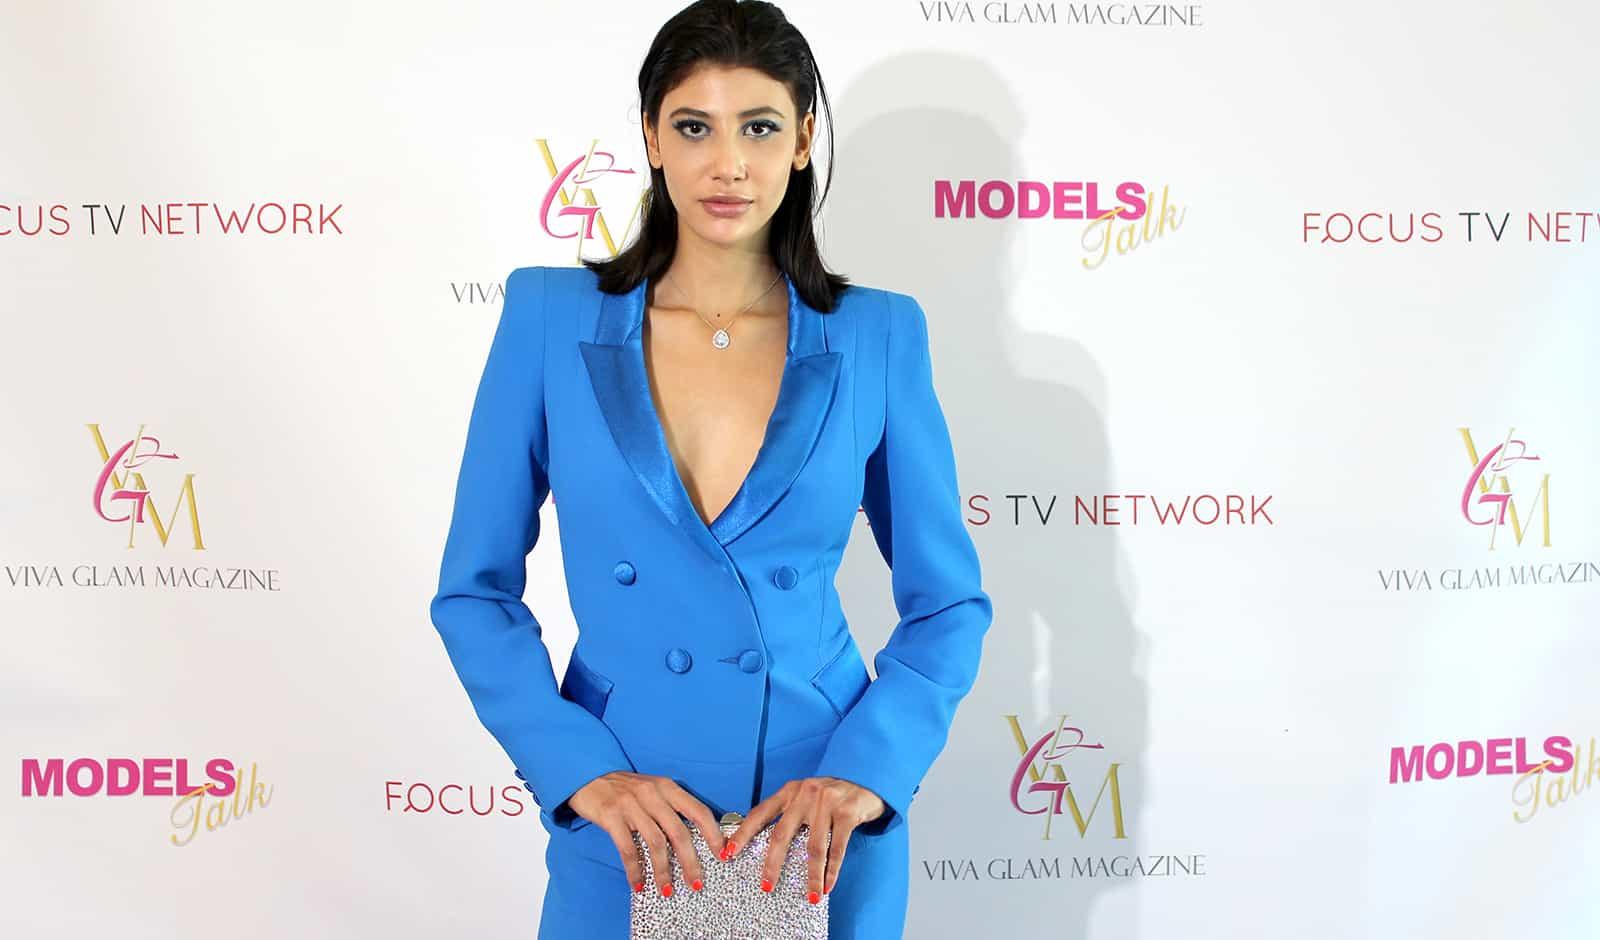 abla-sofy-model-interview